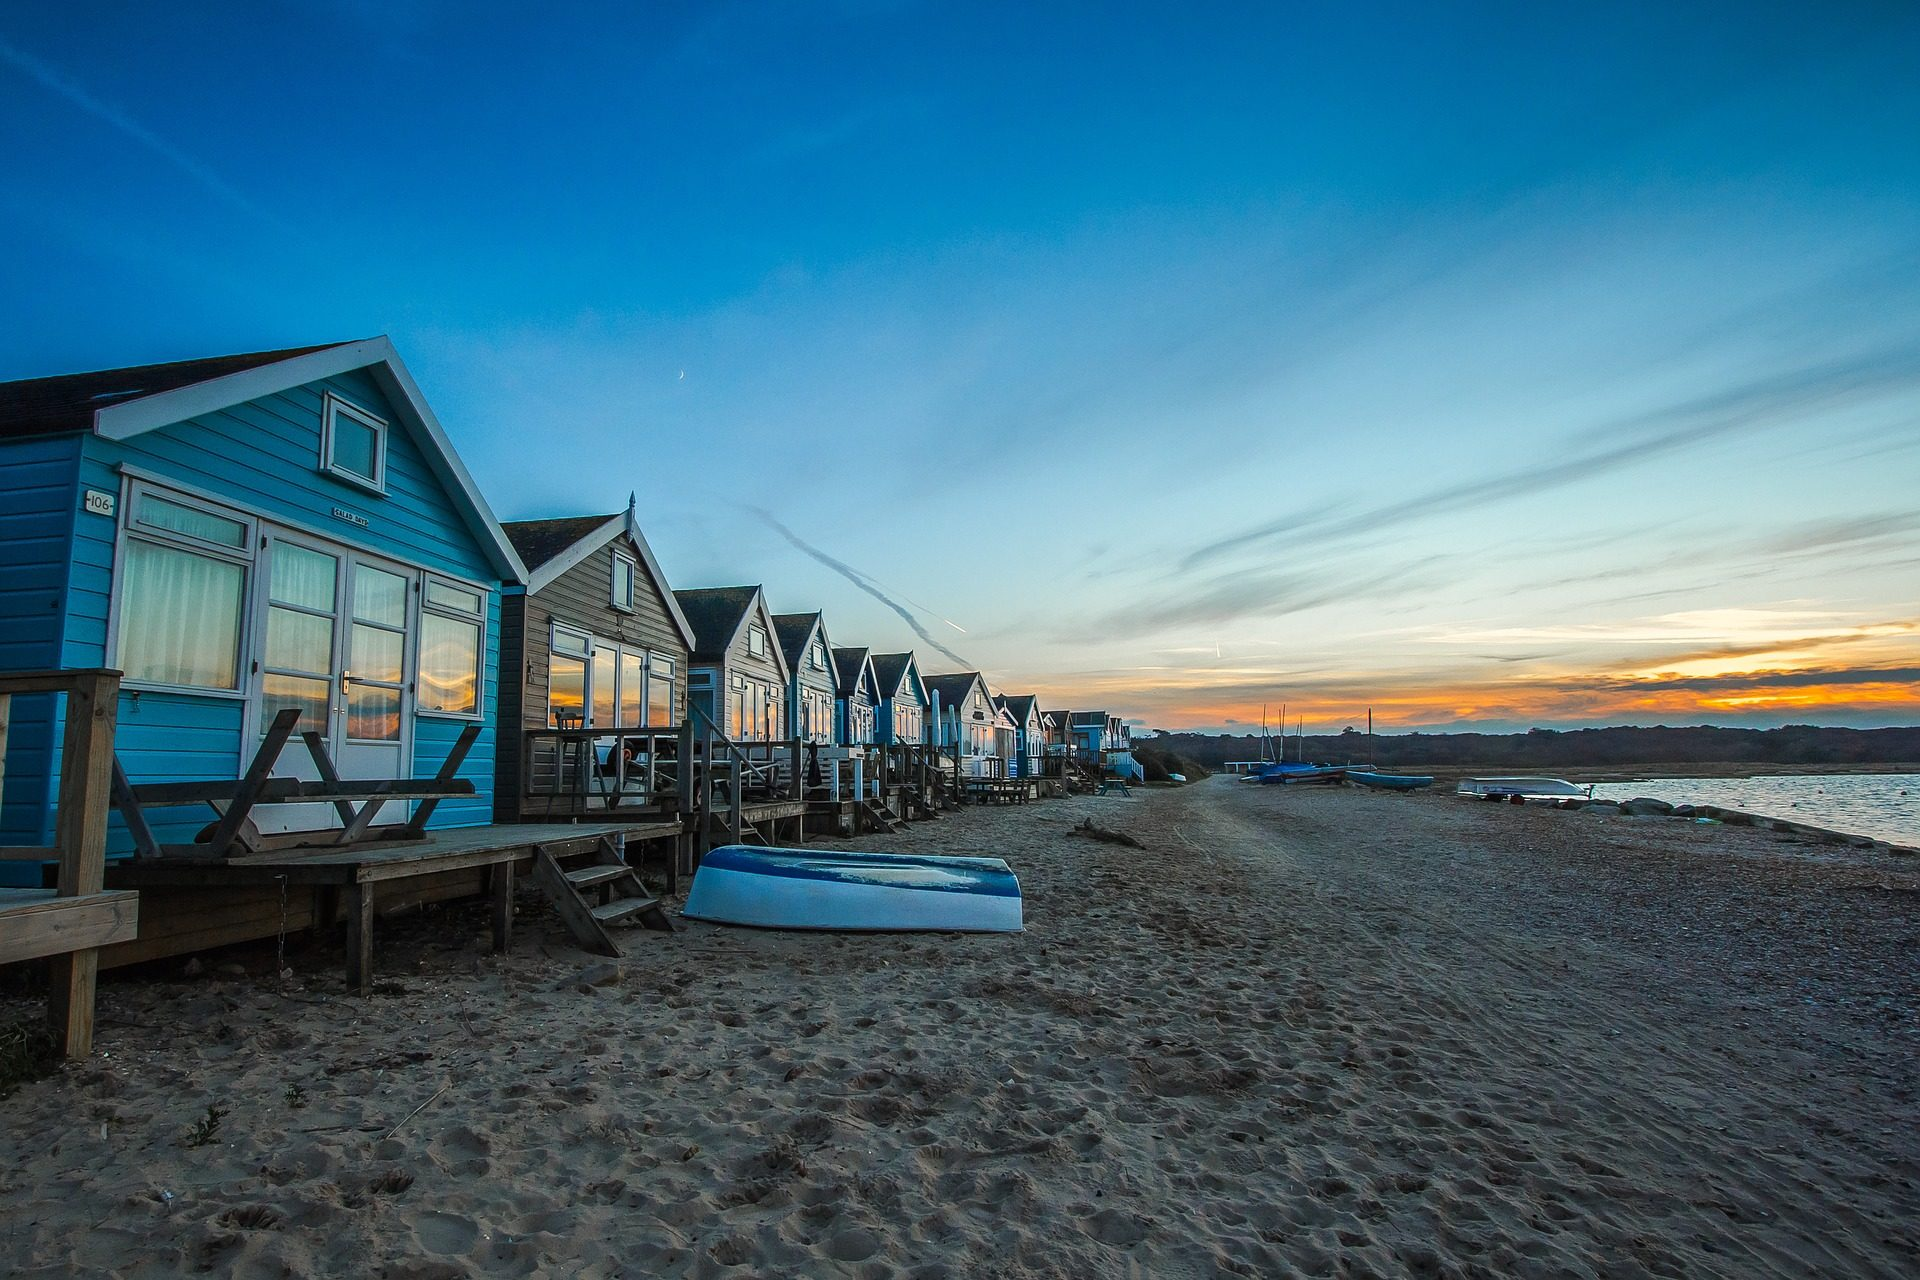 cabines, cabanas, Praia, Costa, Mar, areia, Inglaterra - Papéis de parede HD - Professor-falken.com